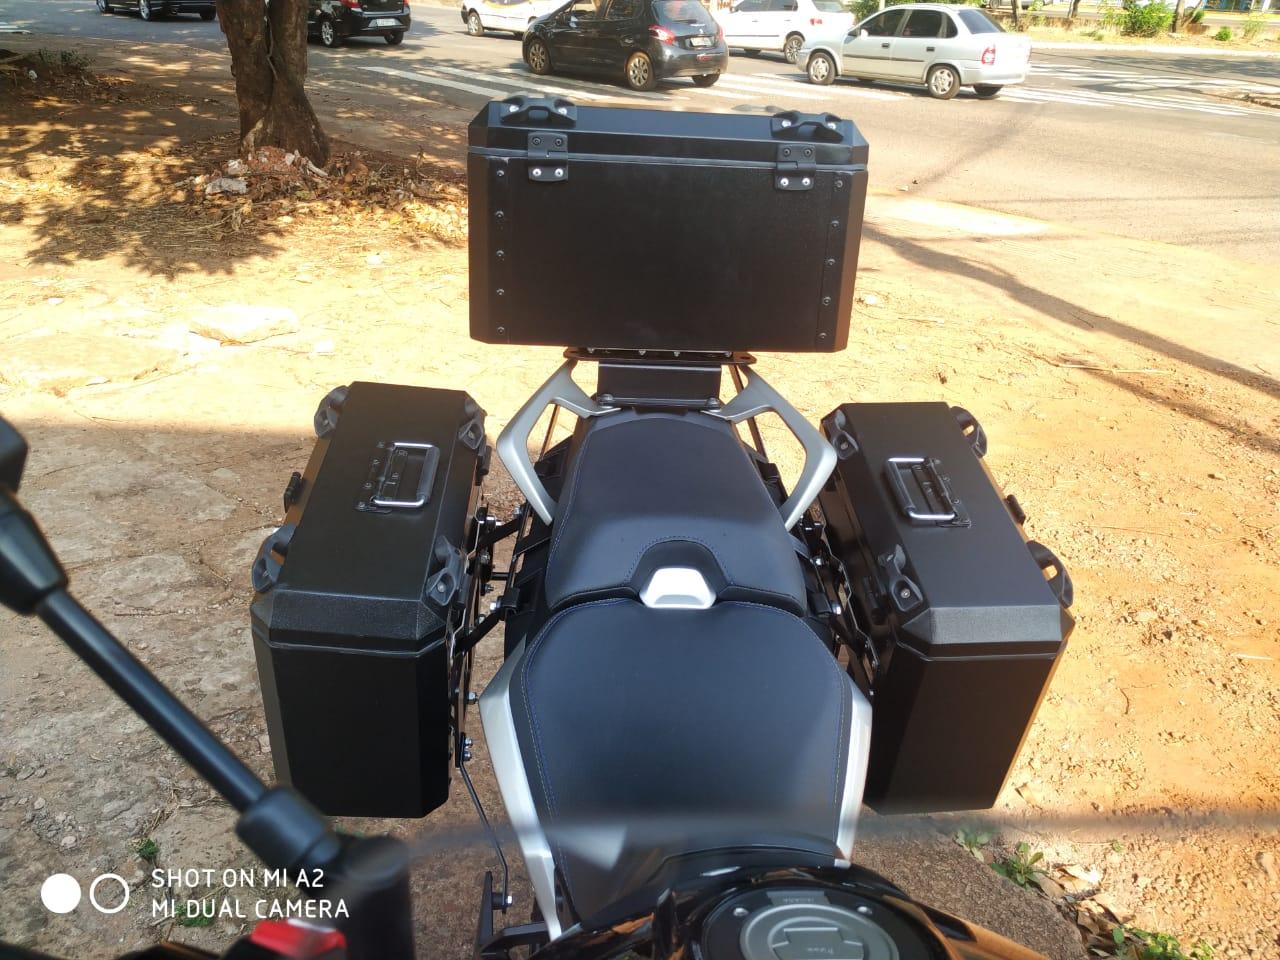 Baú Alumínio Moto Tracer 900 GT Lateral e Traseiro Bauleto Tracer900 Yamaha Livi